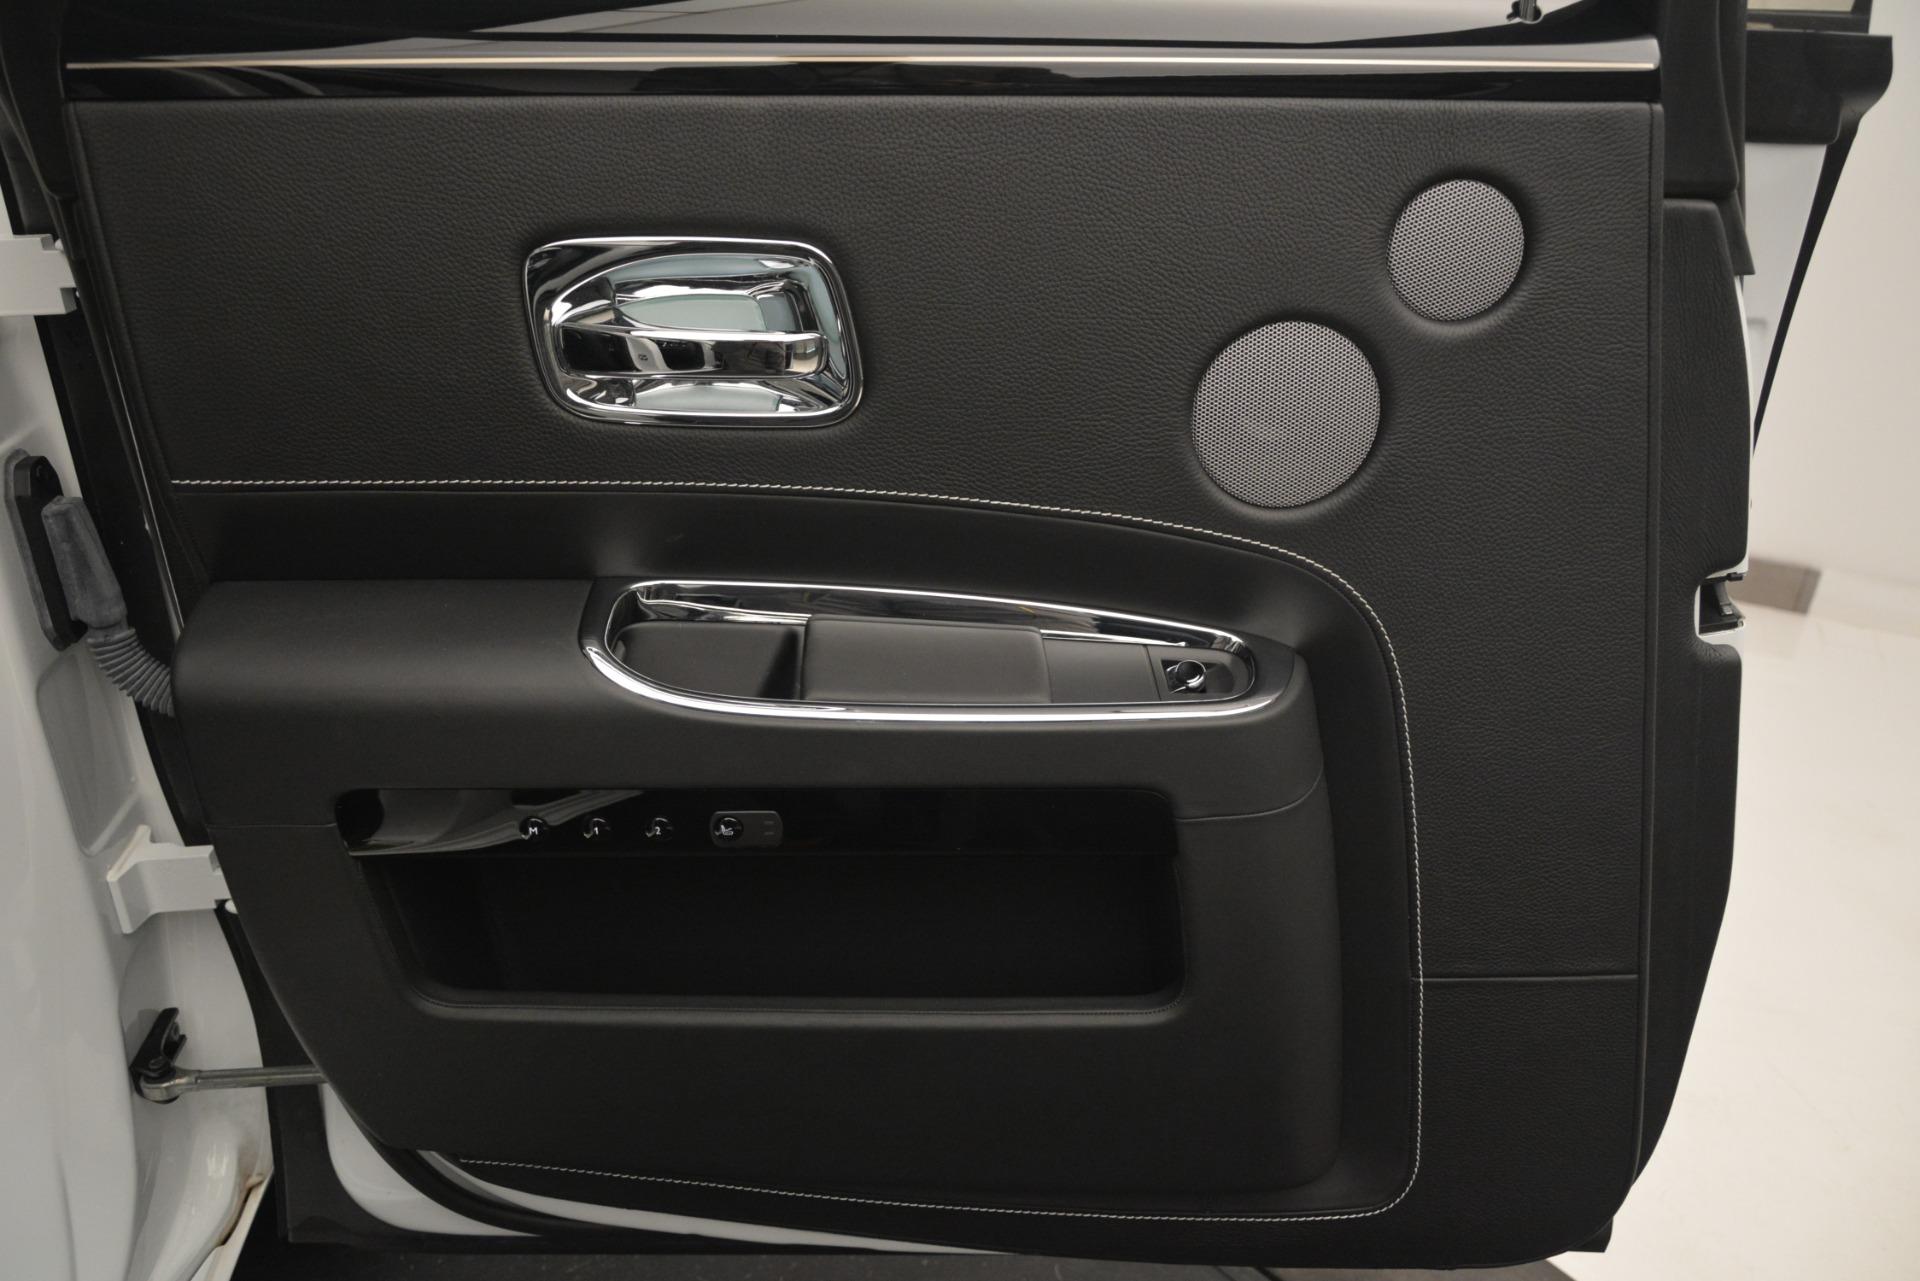 Used 2014 Rolls-Royce Ghost V-Spec For Sale In Westport, CT 2989_p19